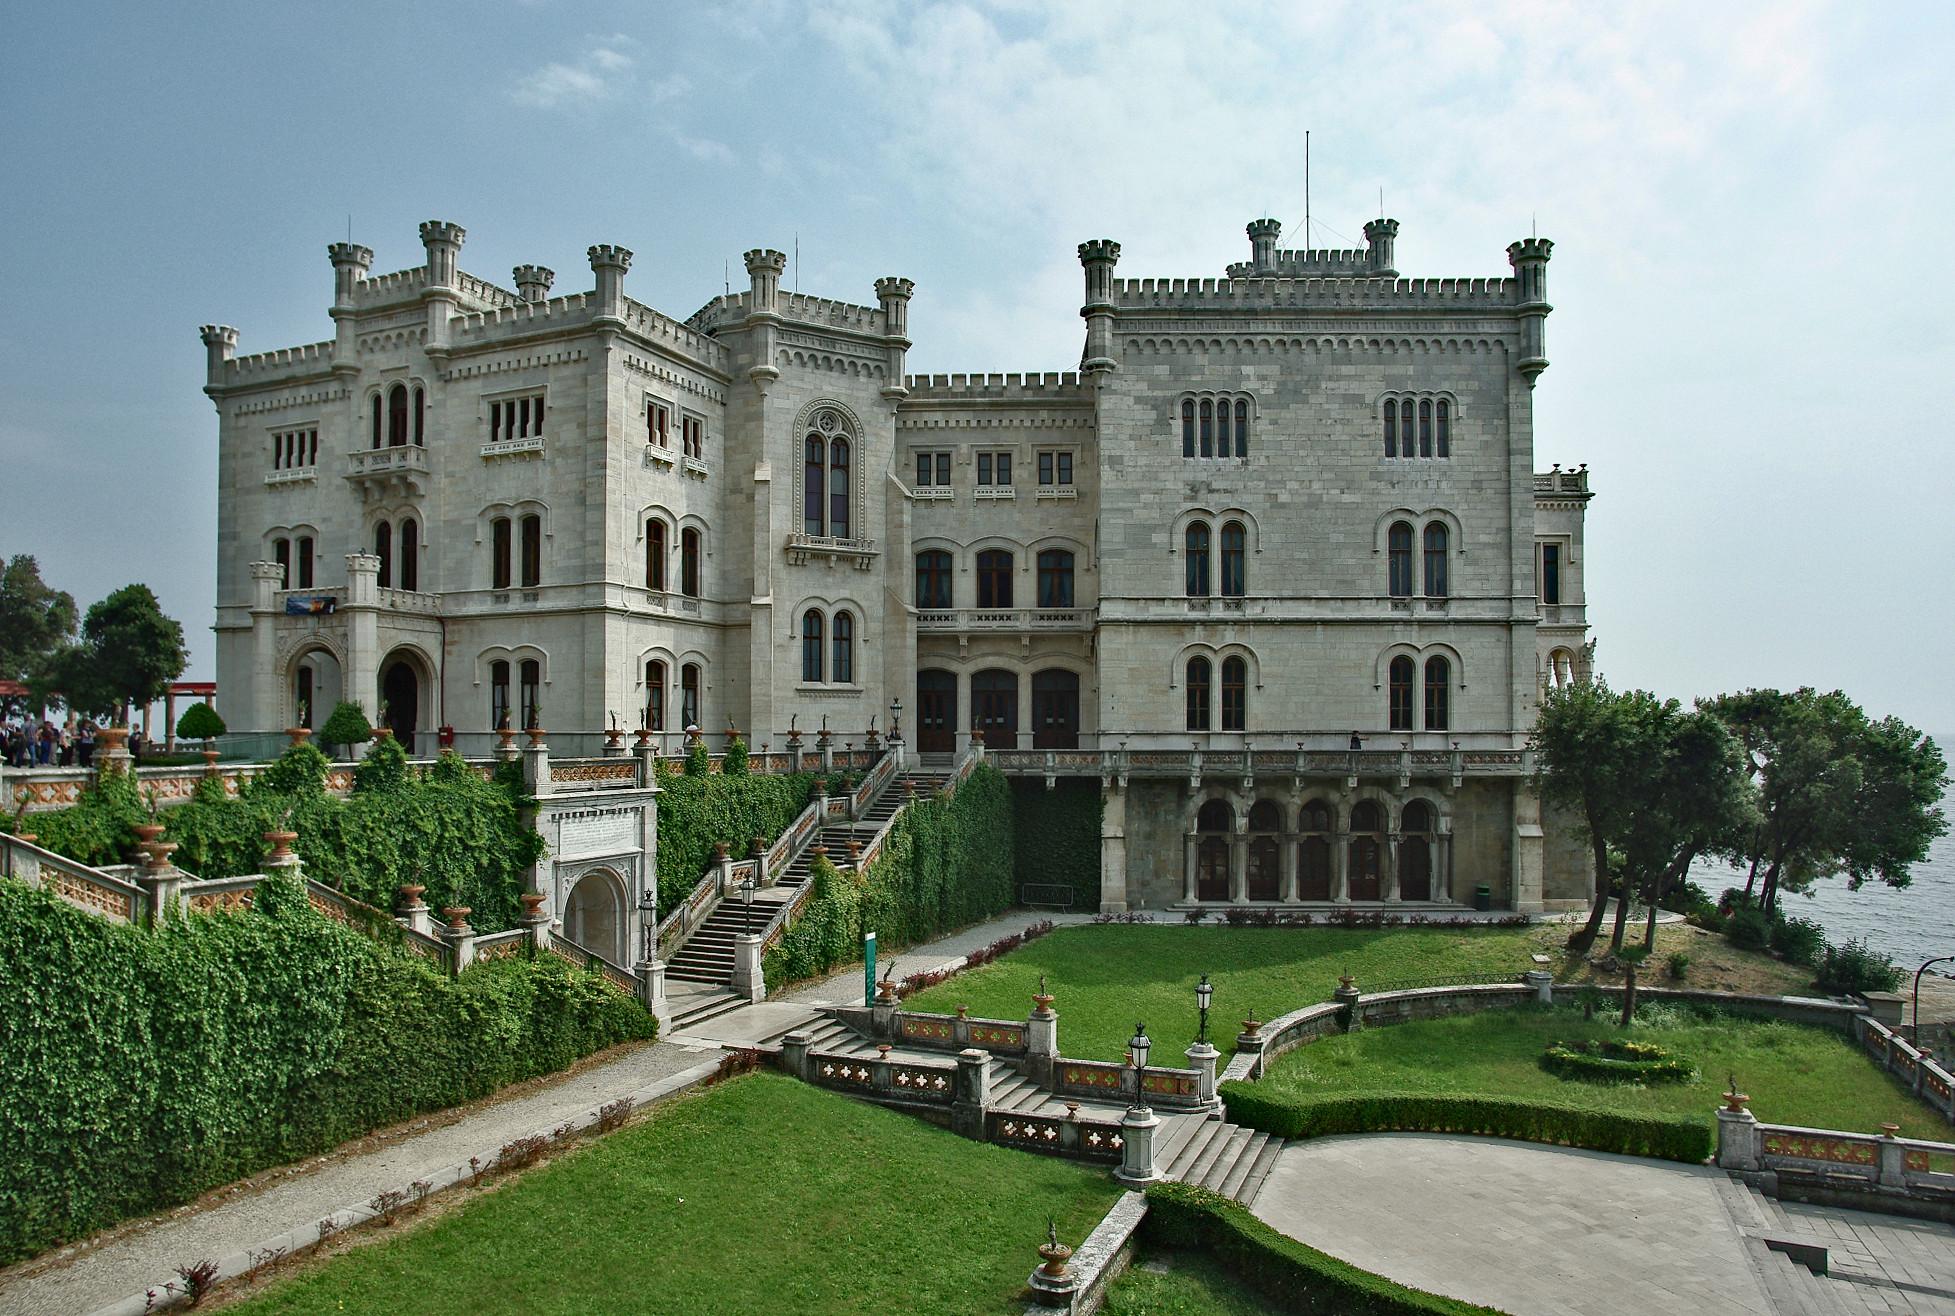 castello miramare trieste storia